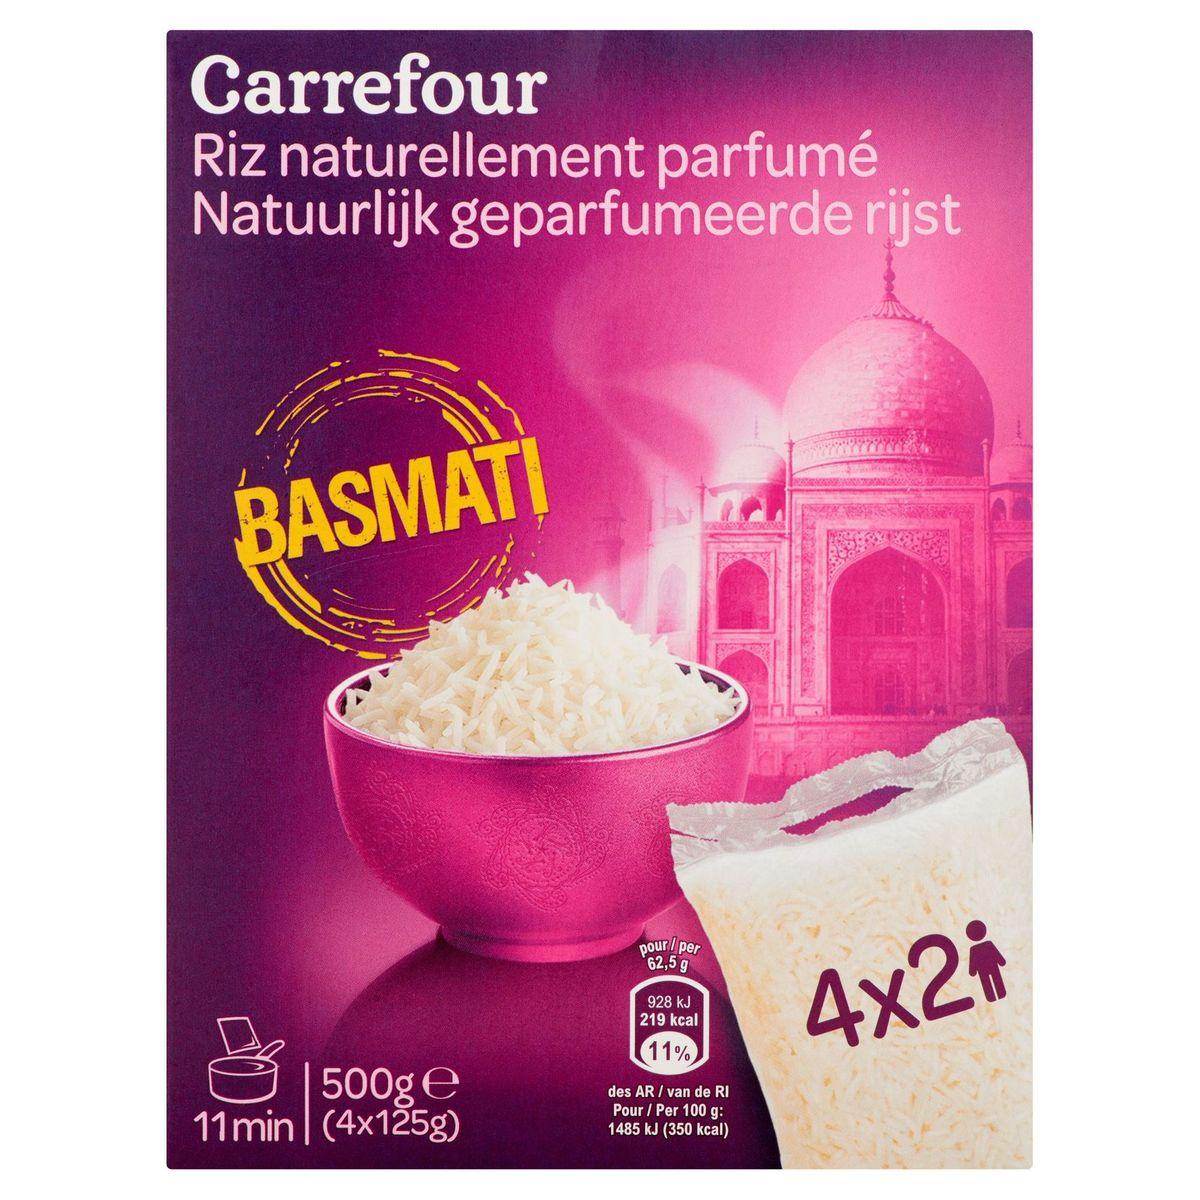 Carrefour Basmati Riz Naturellement Parfumé 4 x 125 g